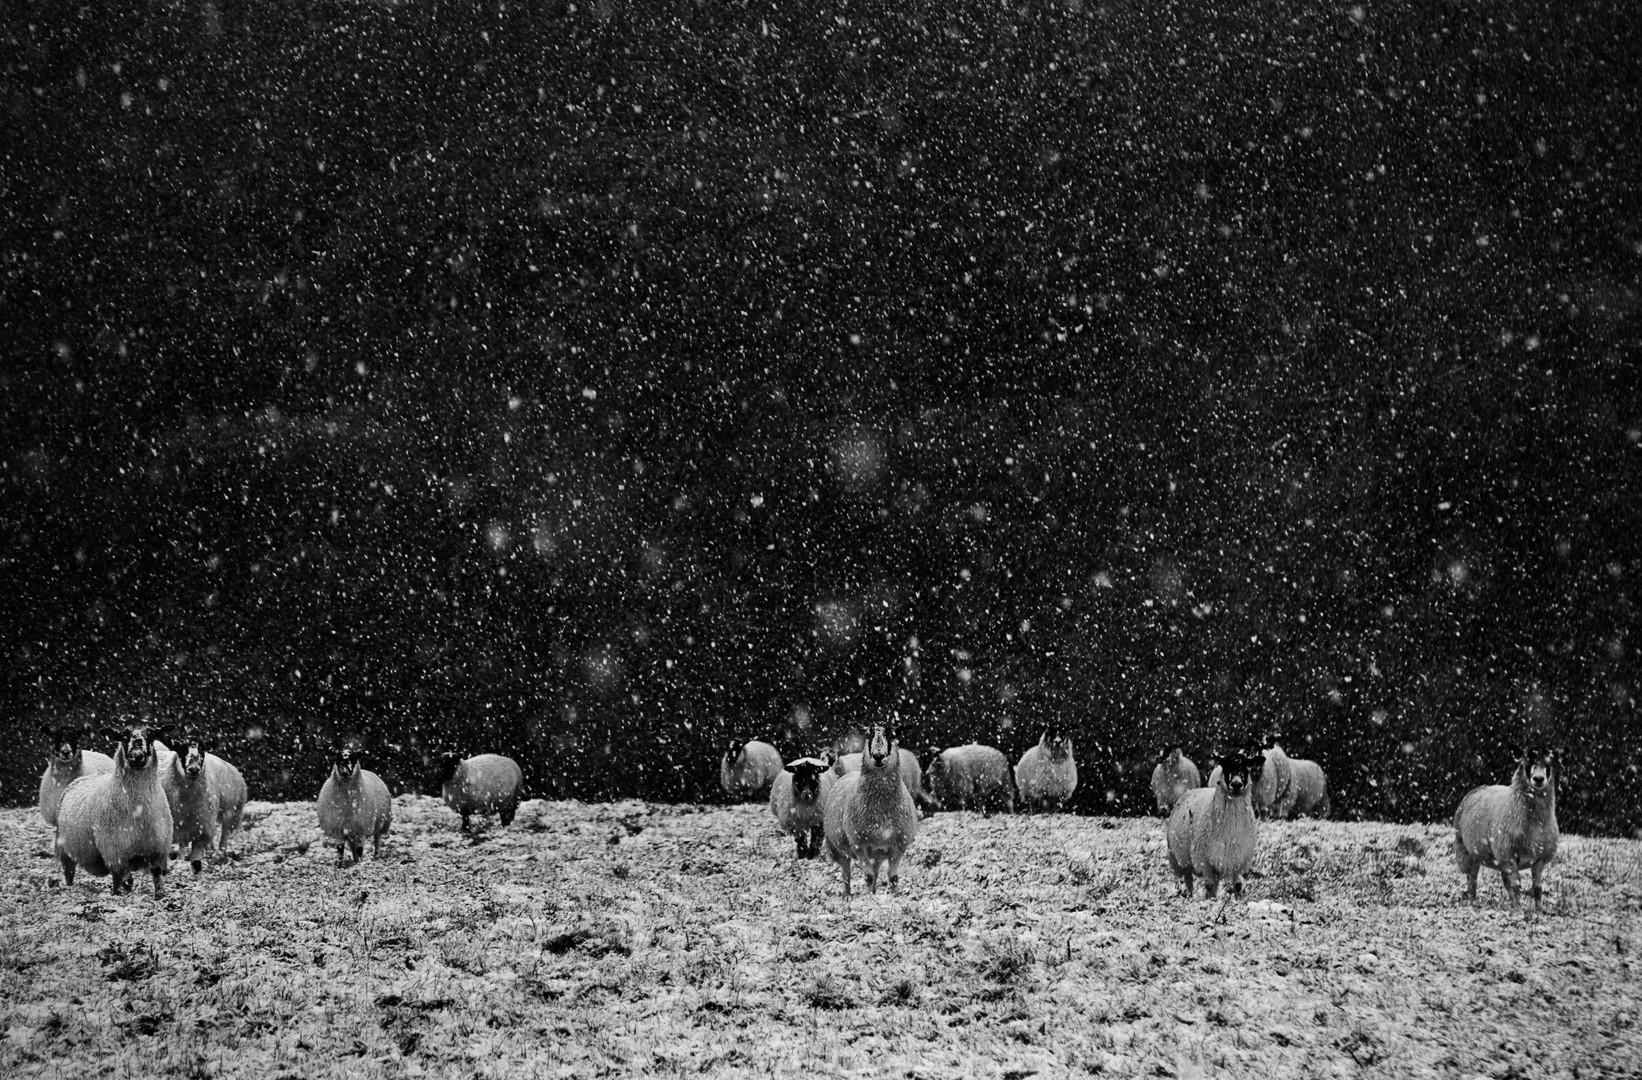 Snowy Sheep Nethercott